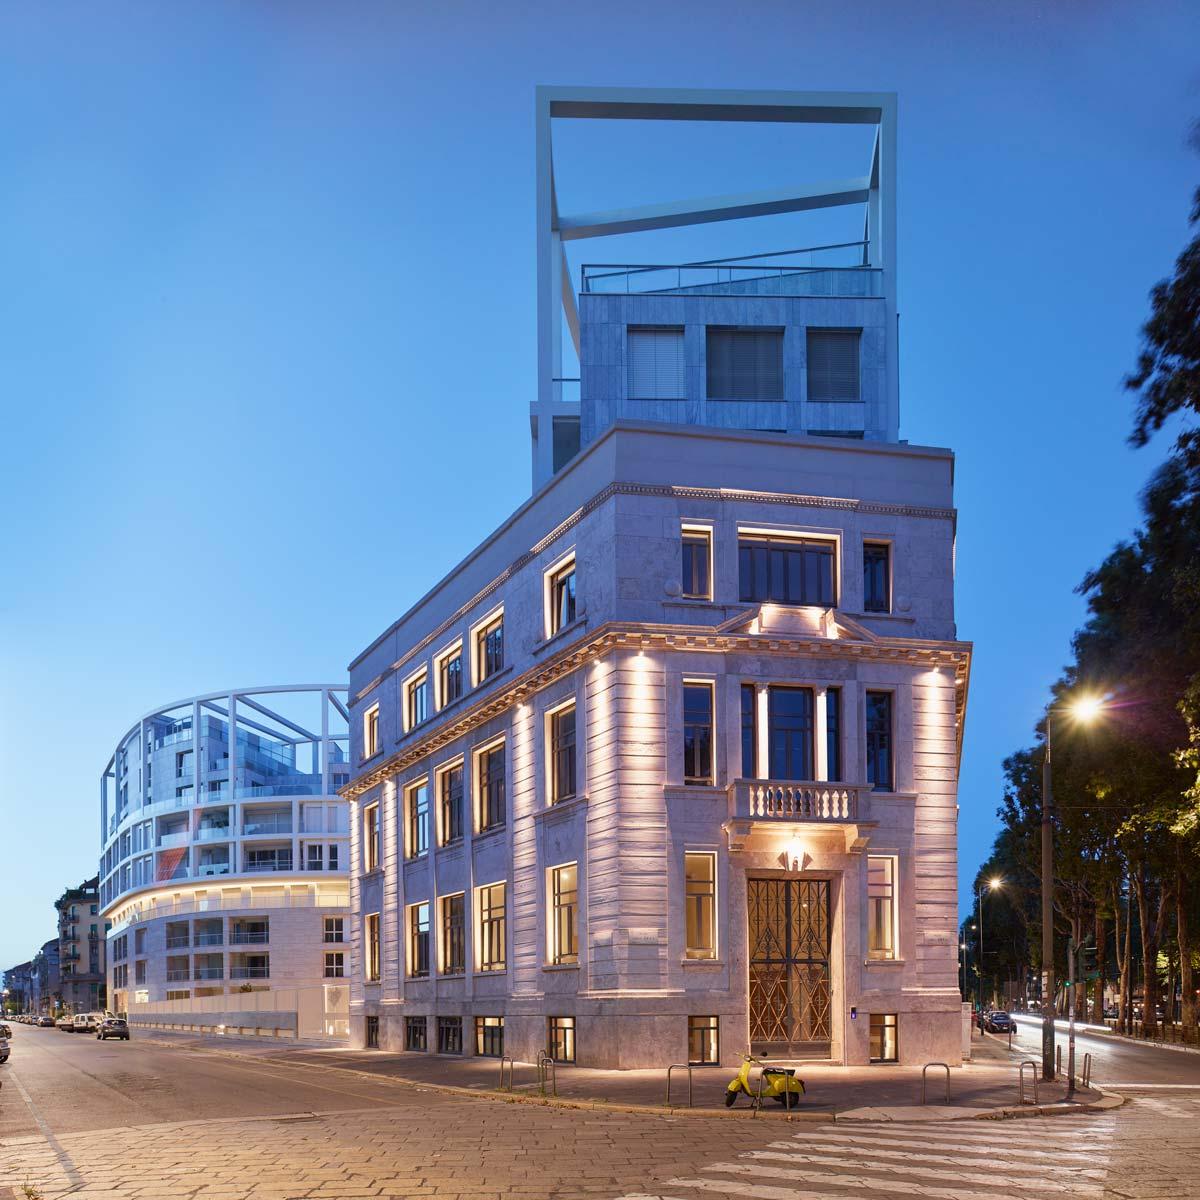 Degli-Esposti-Architetti-Milan-Residenze-Carlo-Erba-06